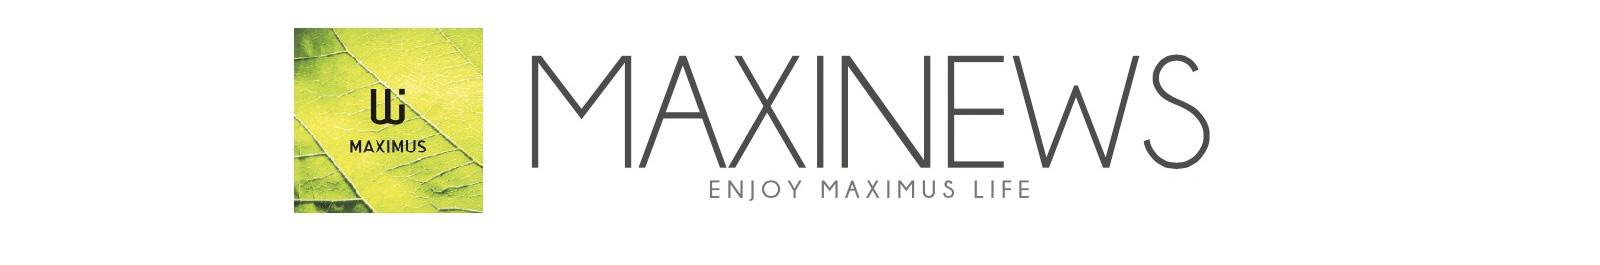 maxinews2